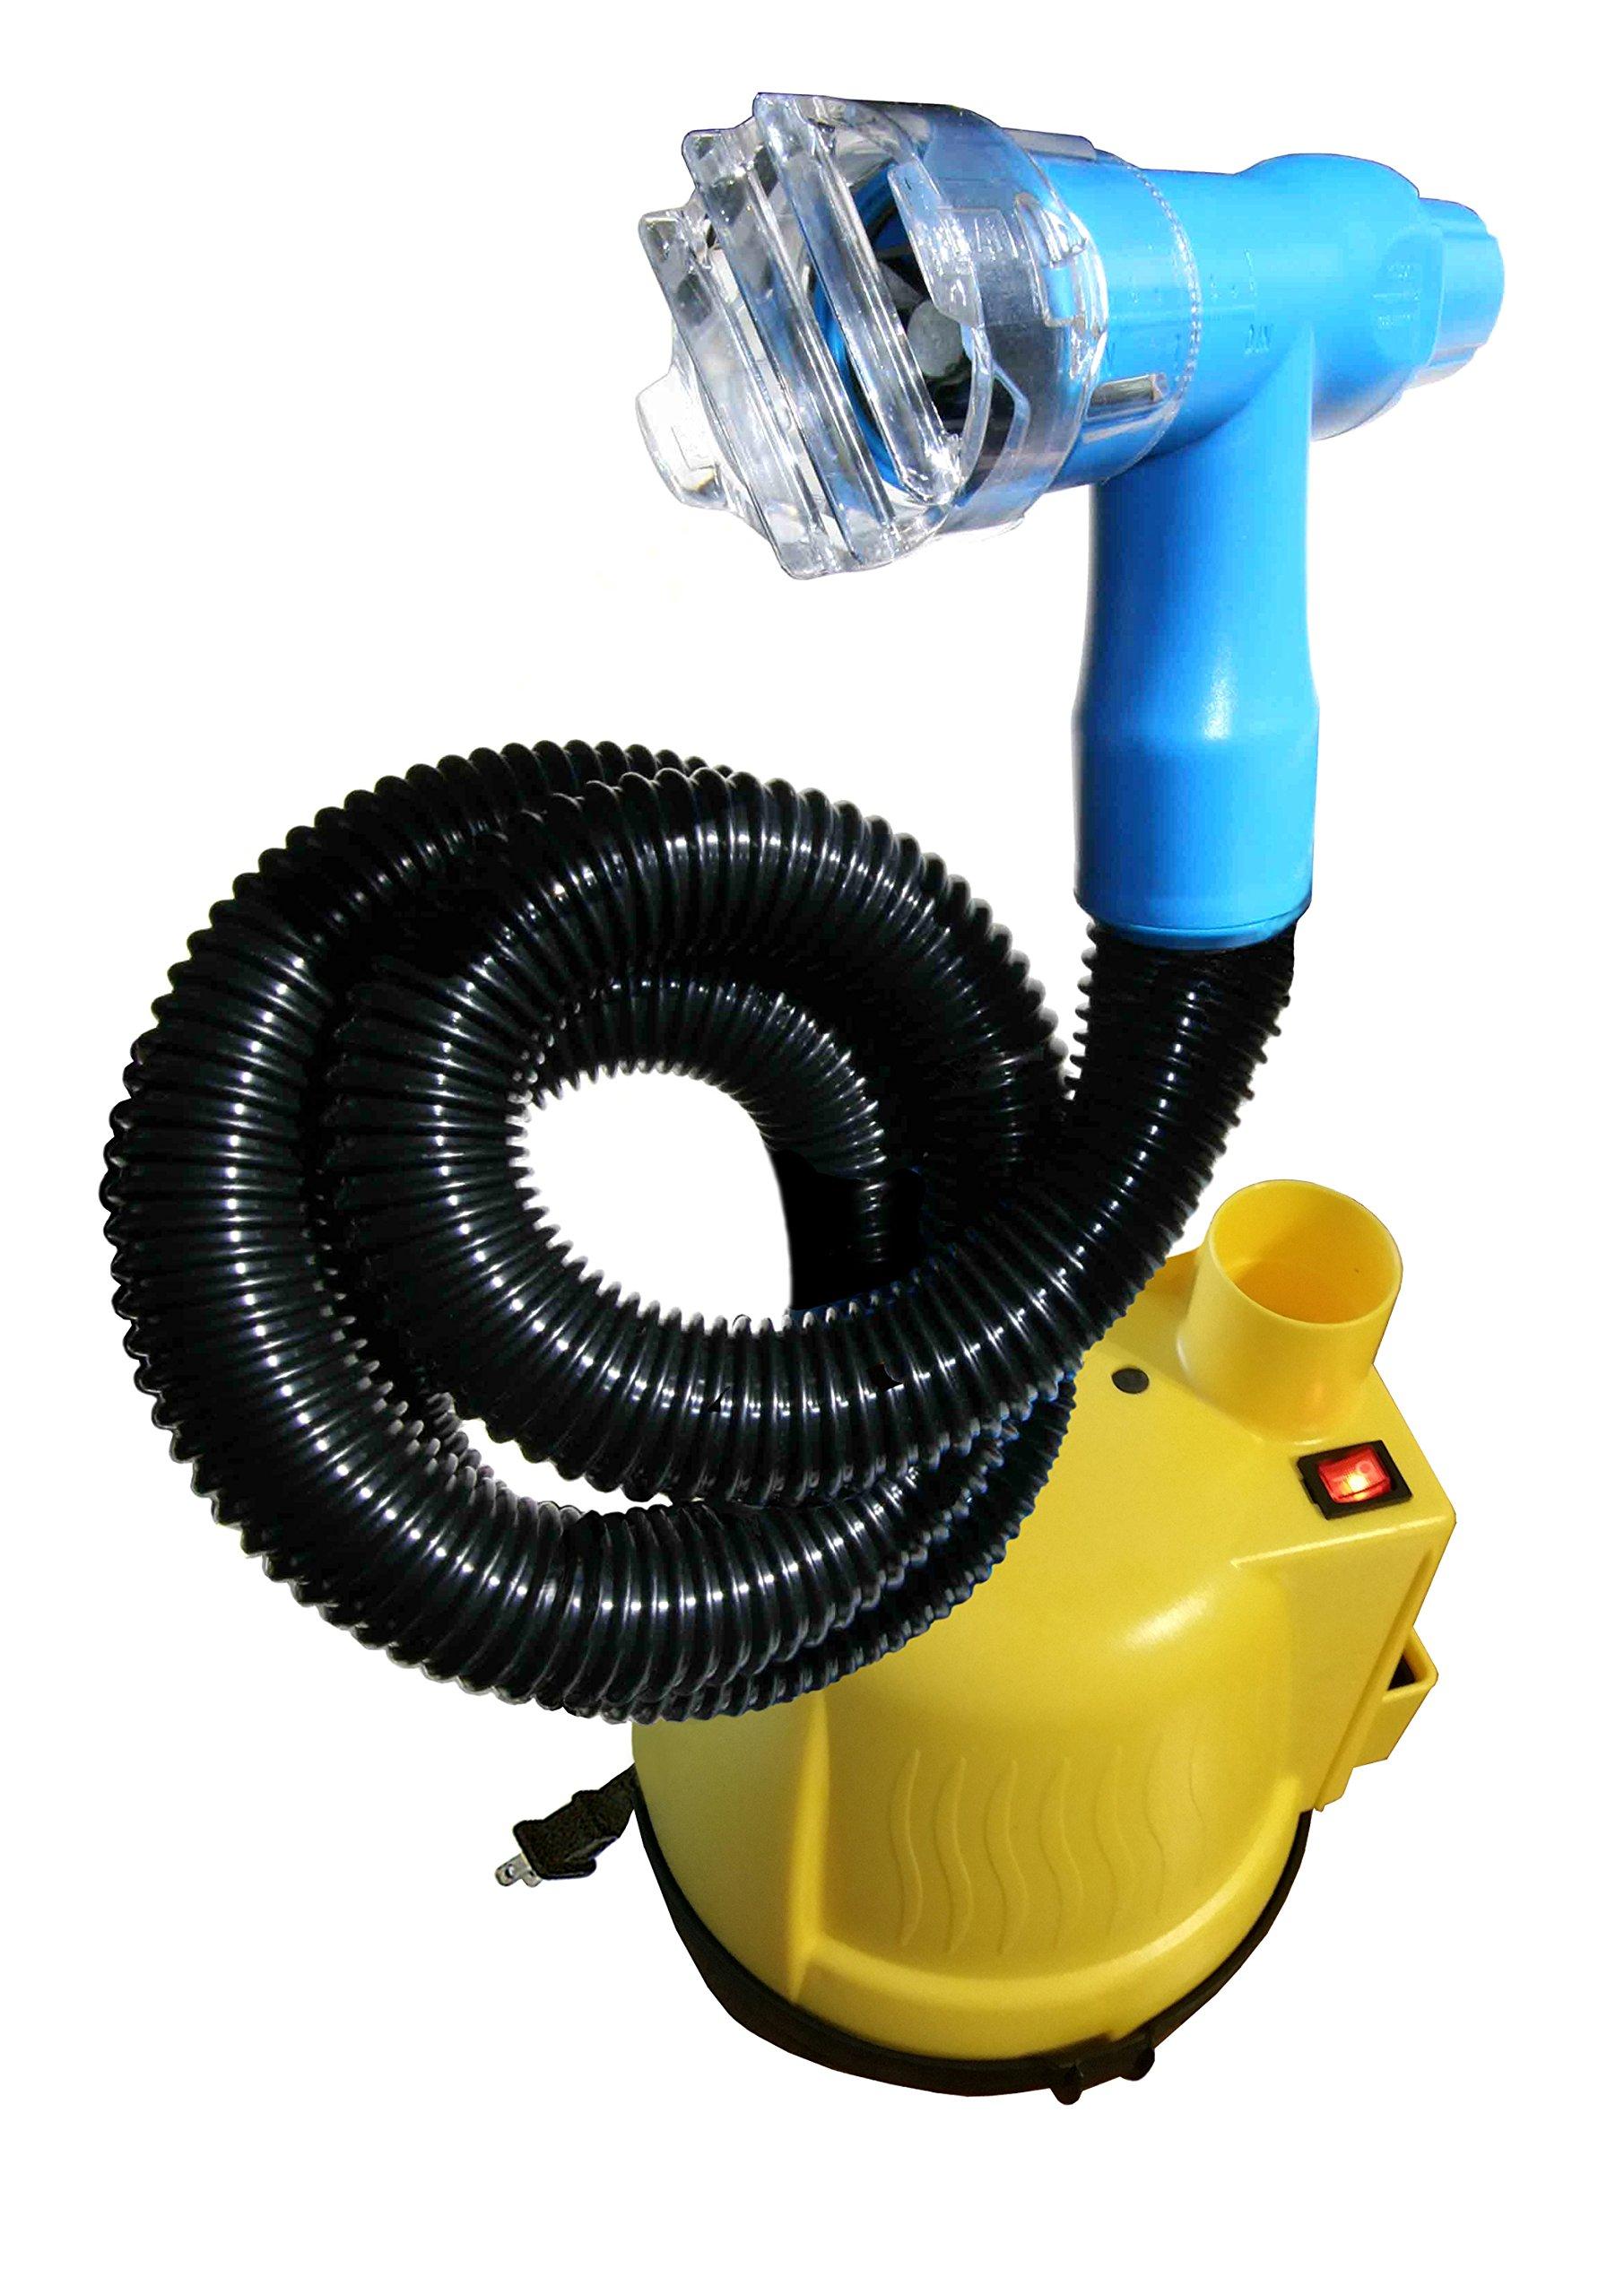 Haircut Pro-Bumblebee Vacuum Haircutter, Yellow/Blue, 8 Pound